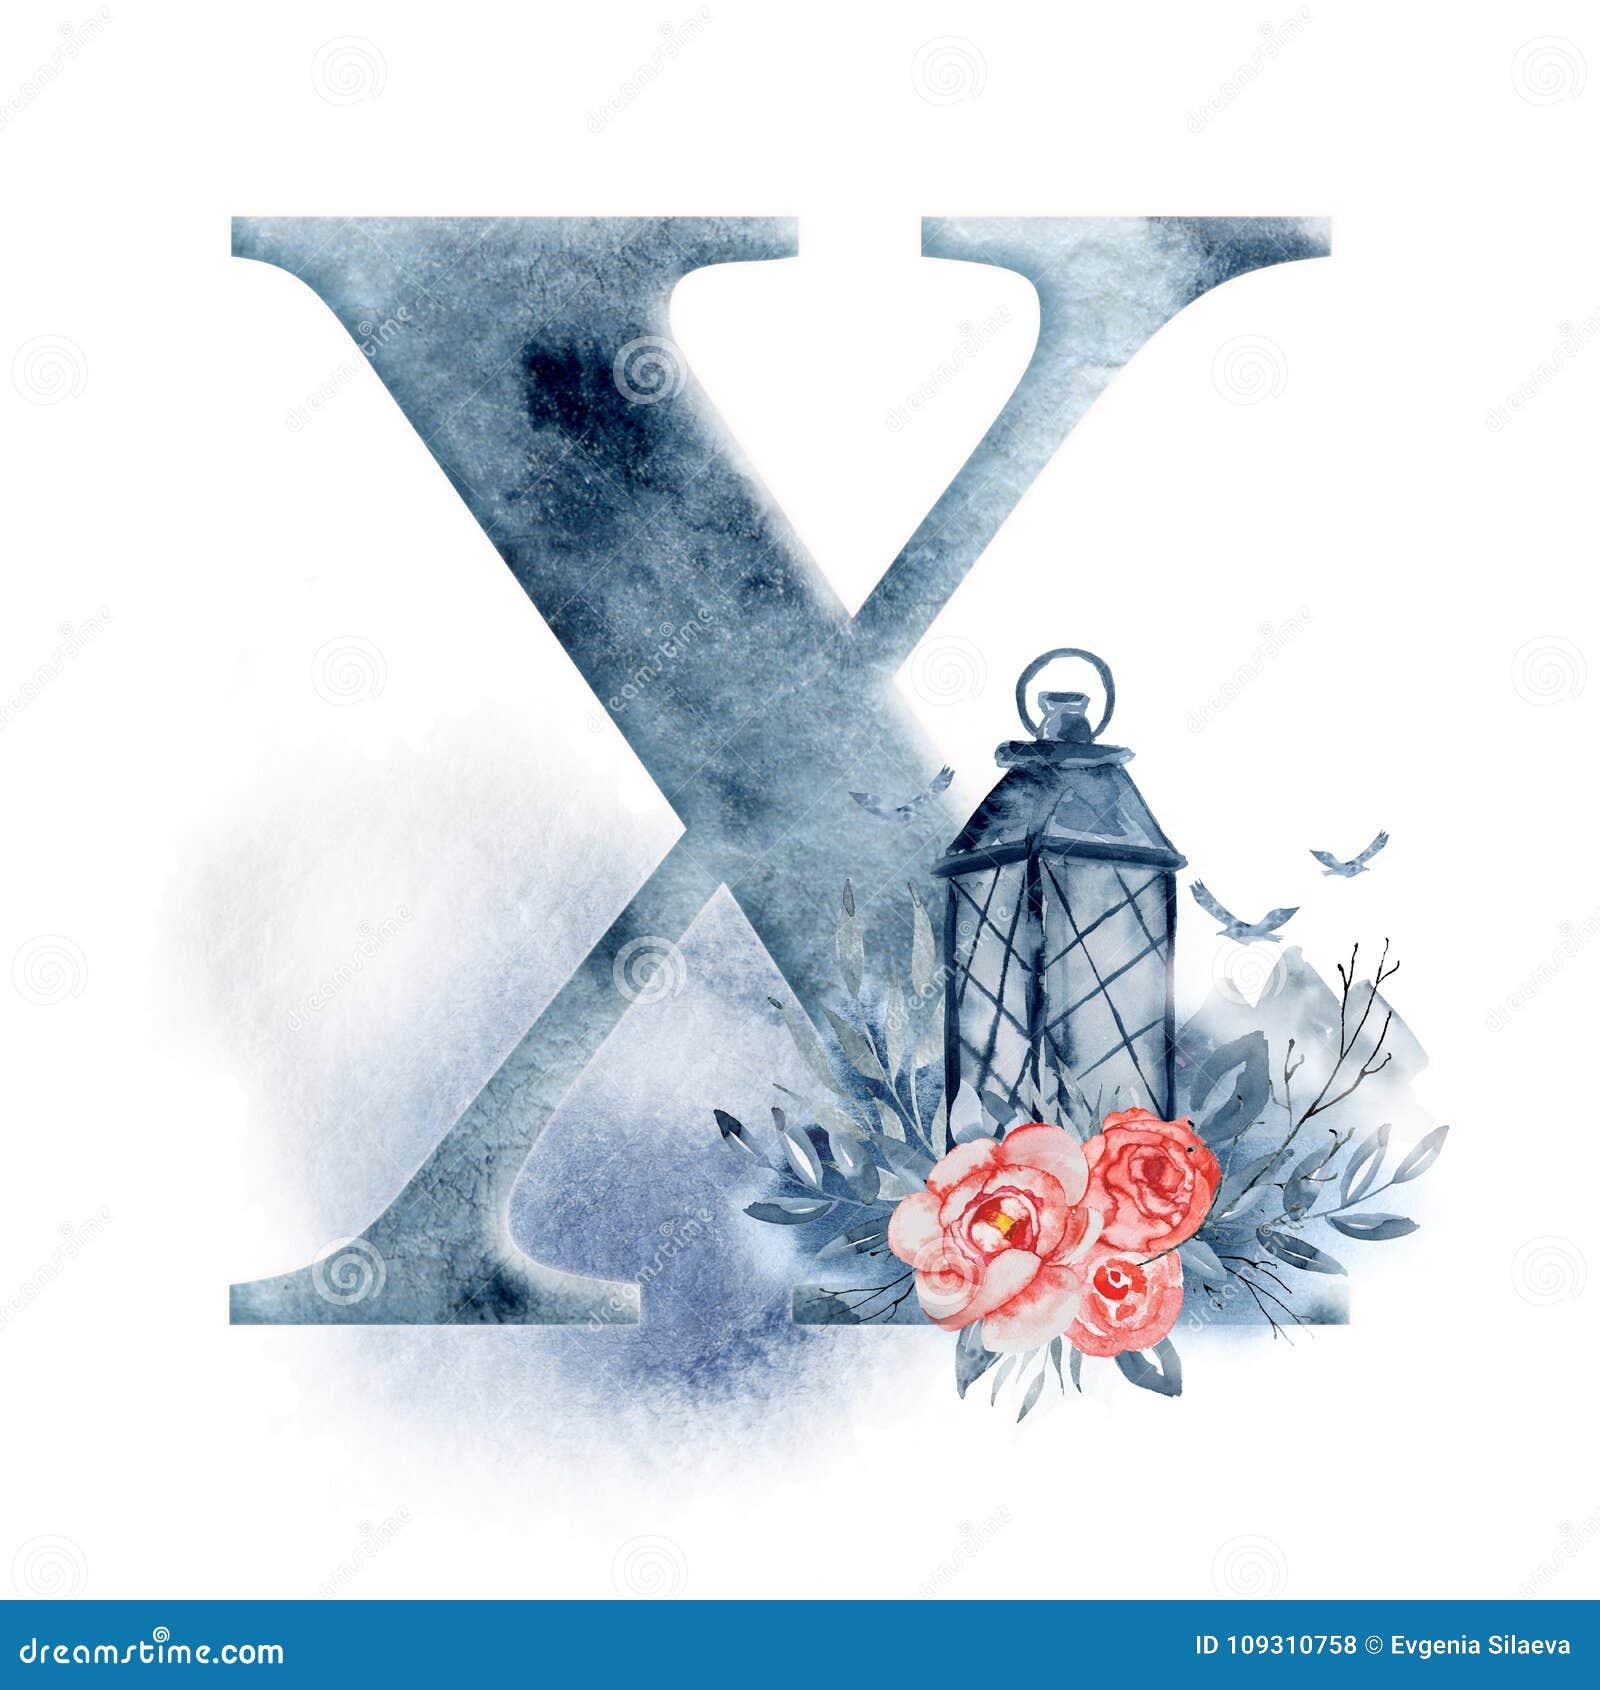 Floral Watercolor Alphabet Monogram Initial Letter Z Design With